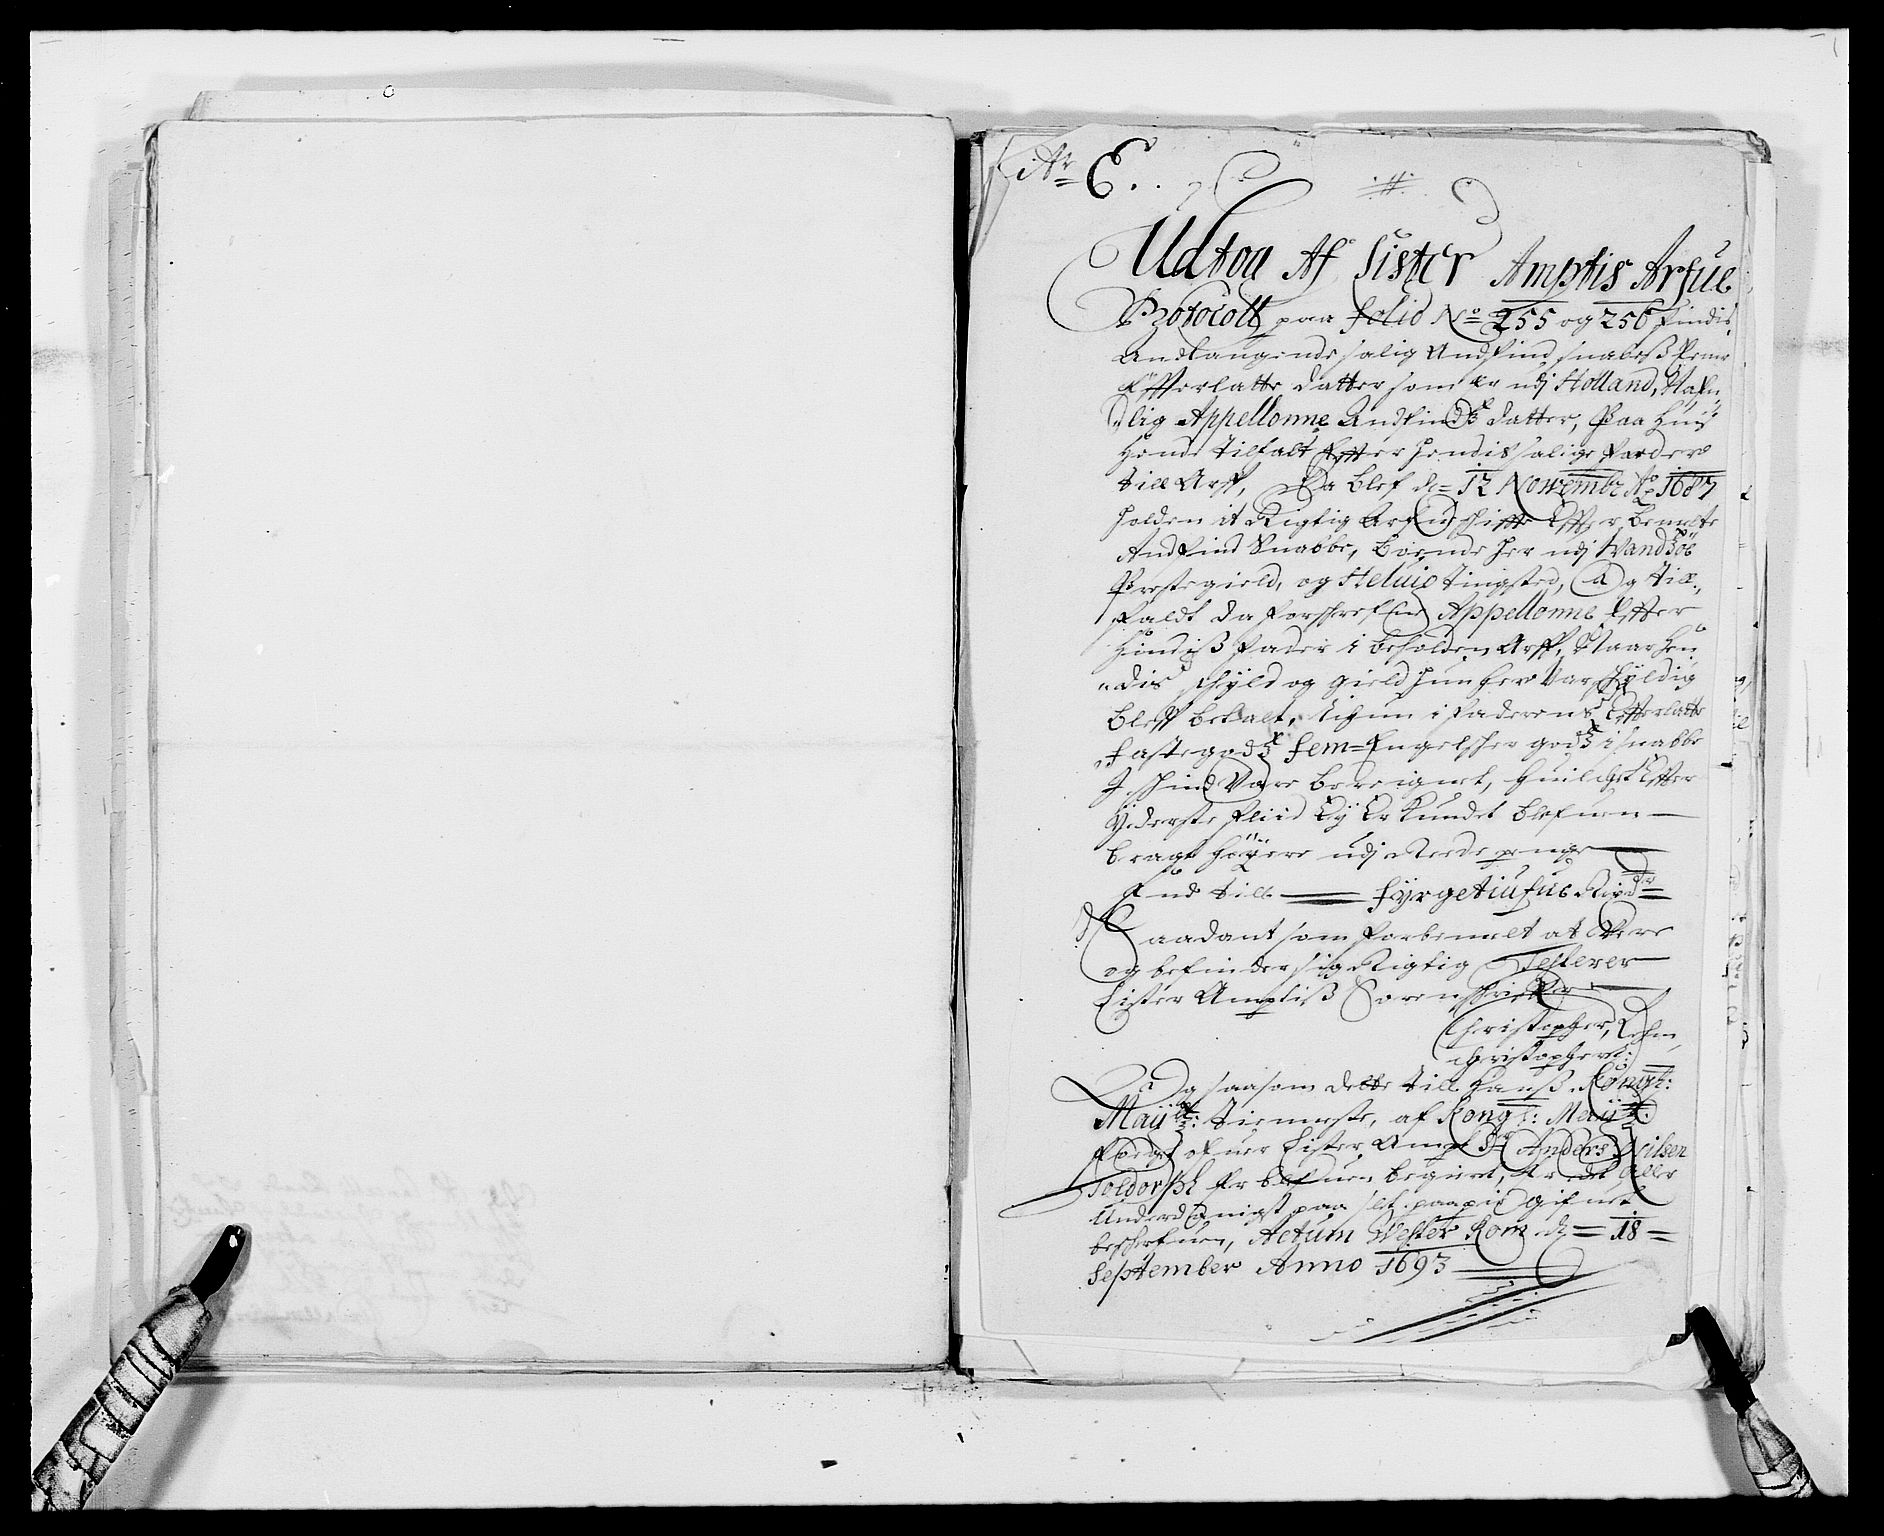 RA, Rentekammeret inntil 1814, Reviderte regnskaper, Fogderegnskap, R41/L2536: Fogderegnskap Lista, 1690-1693, s. 230